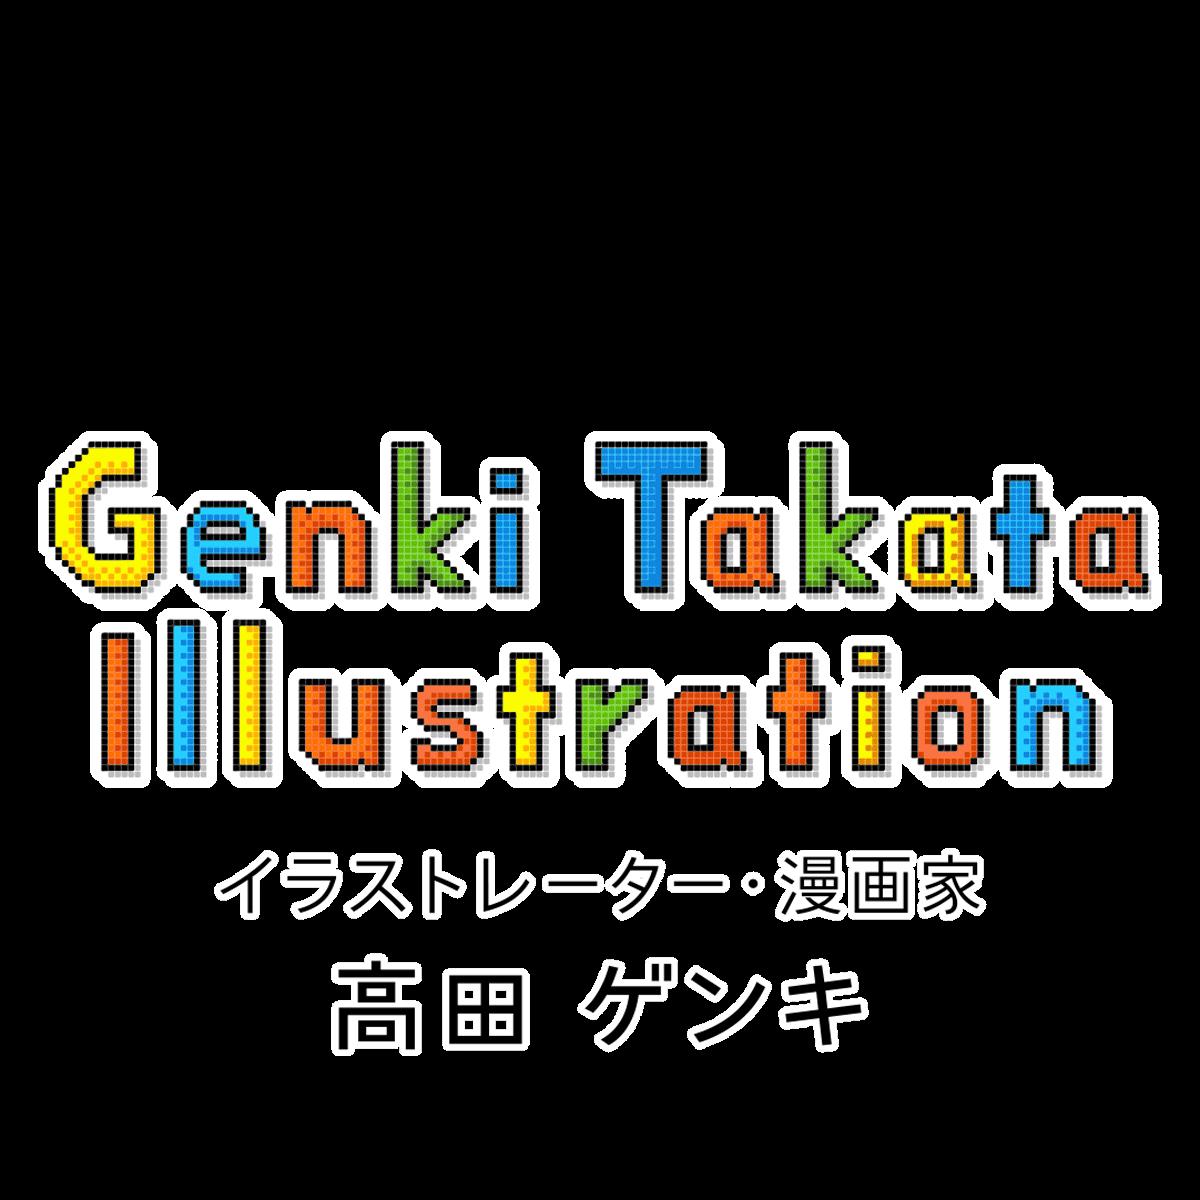 Genki Takata Illustration